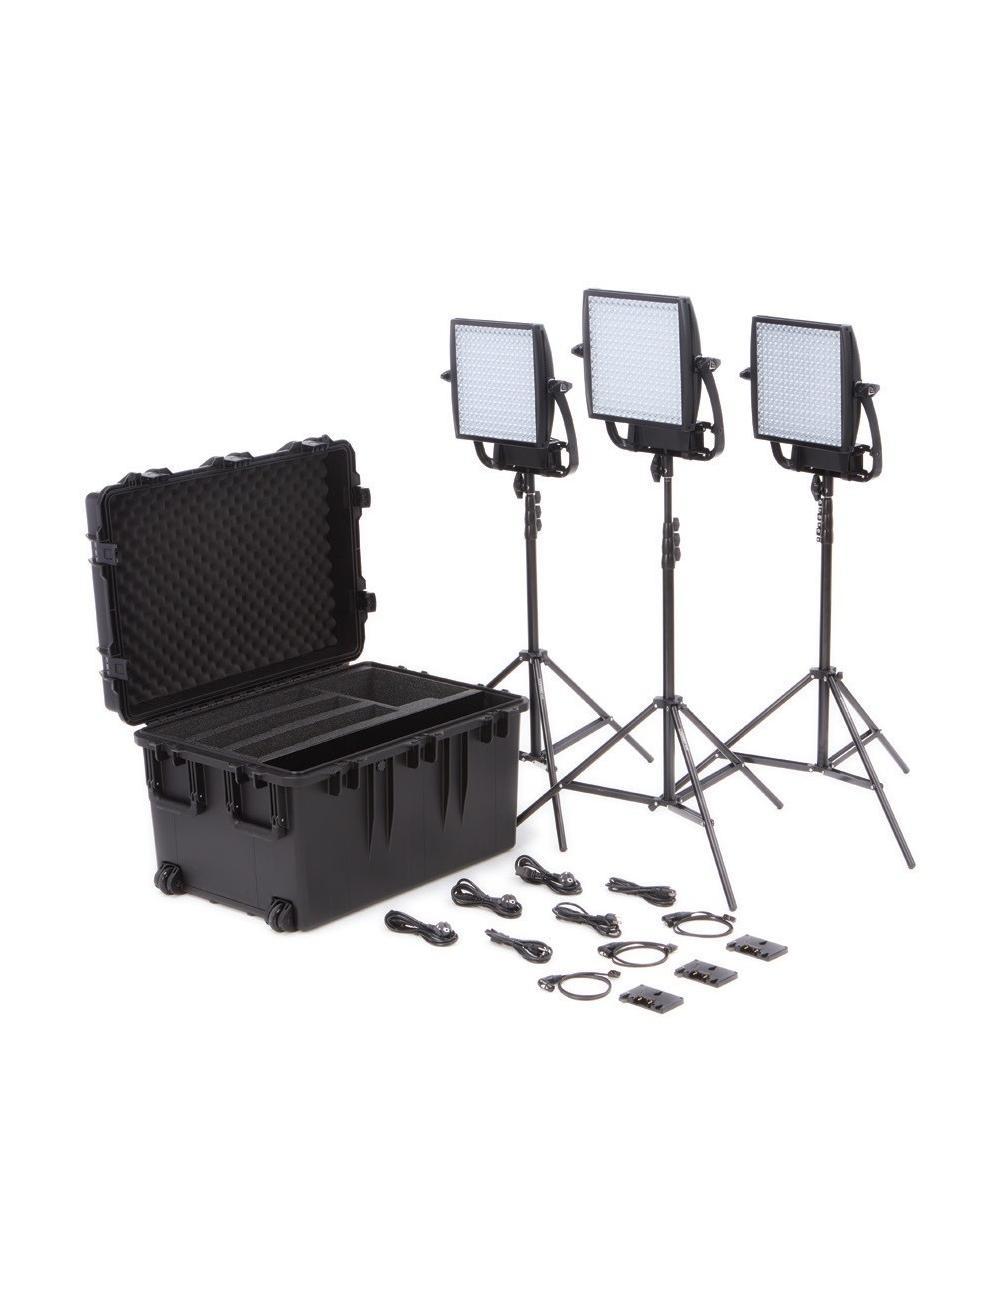 Litepanels Astra Soft + Astra 6X Traveler Trio V-Mount Kit